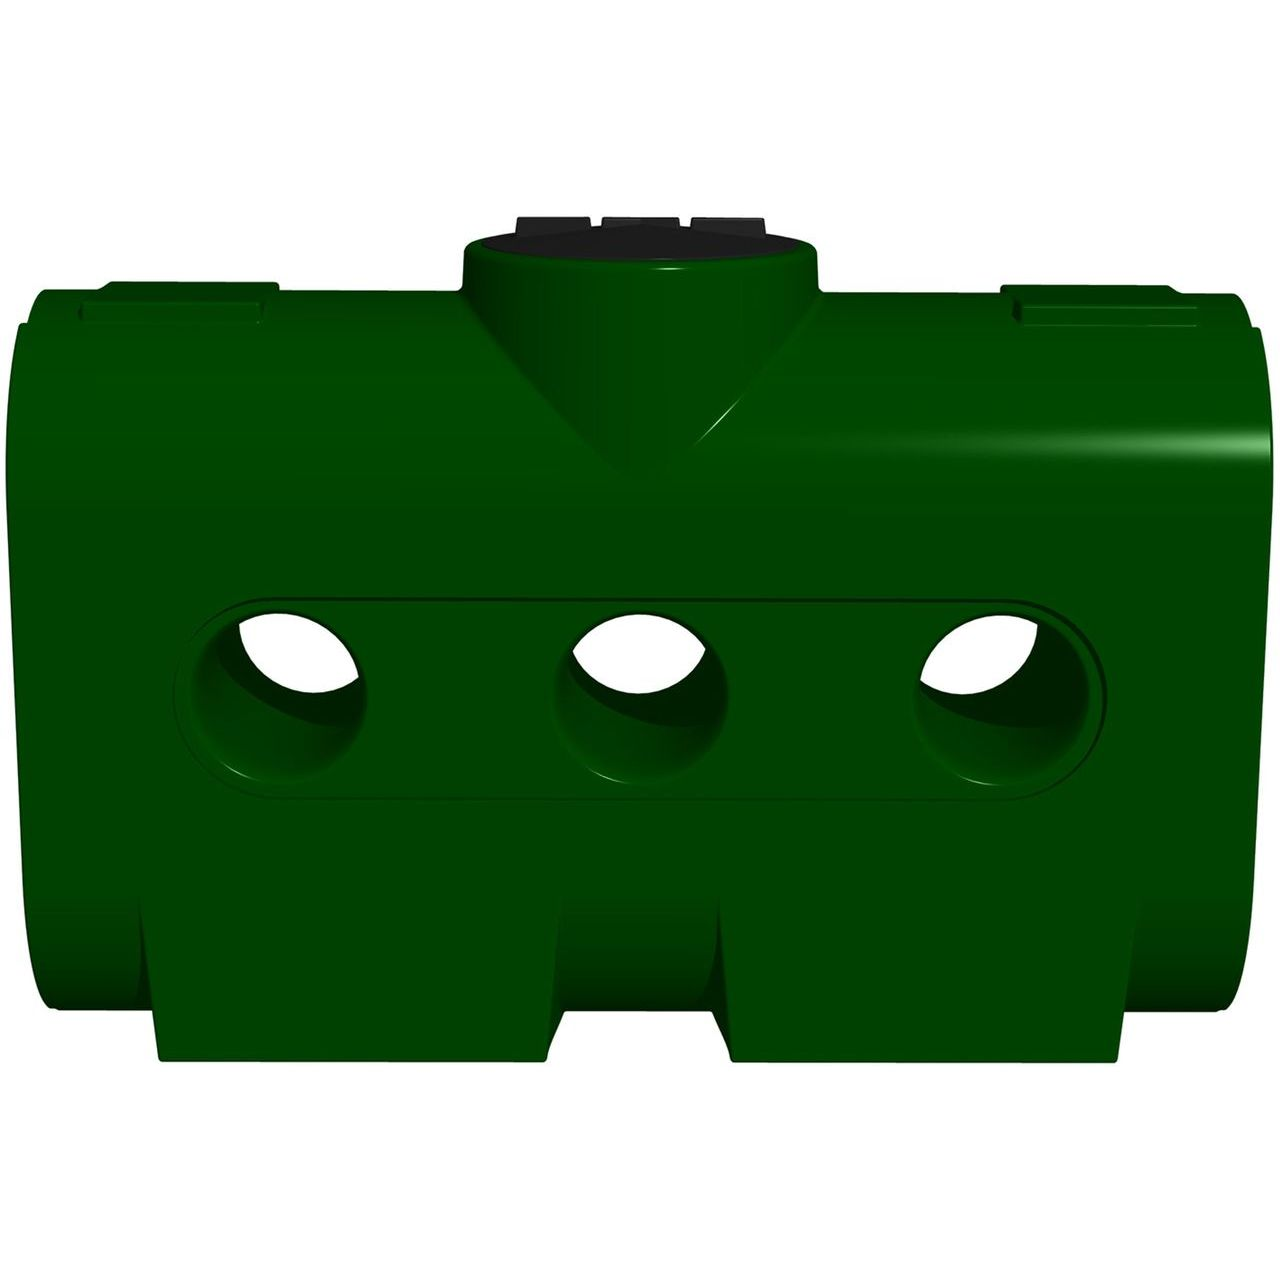 RTS Rectangular Harvest Tank 214USG/178IG/810L in Green